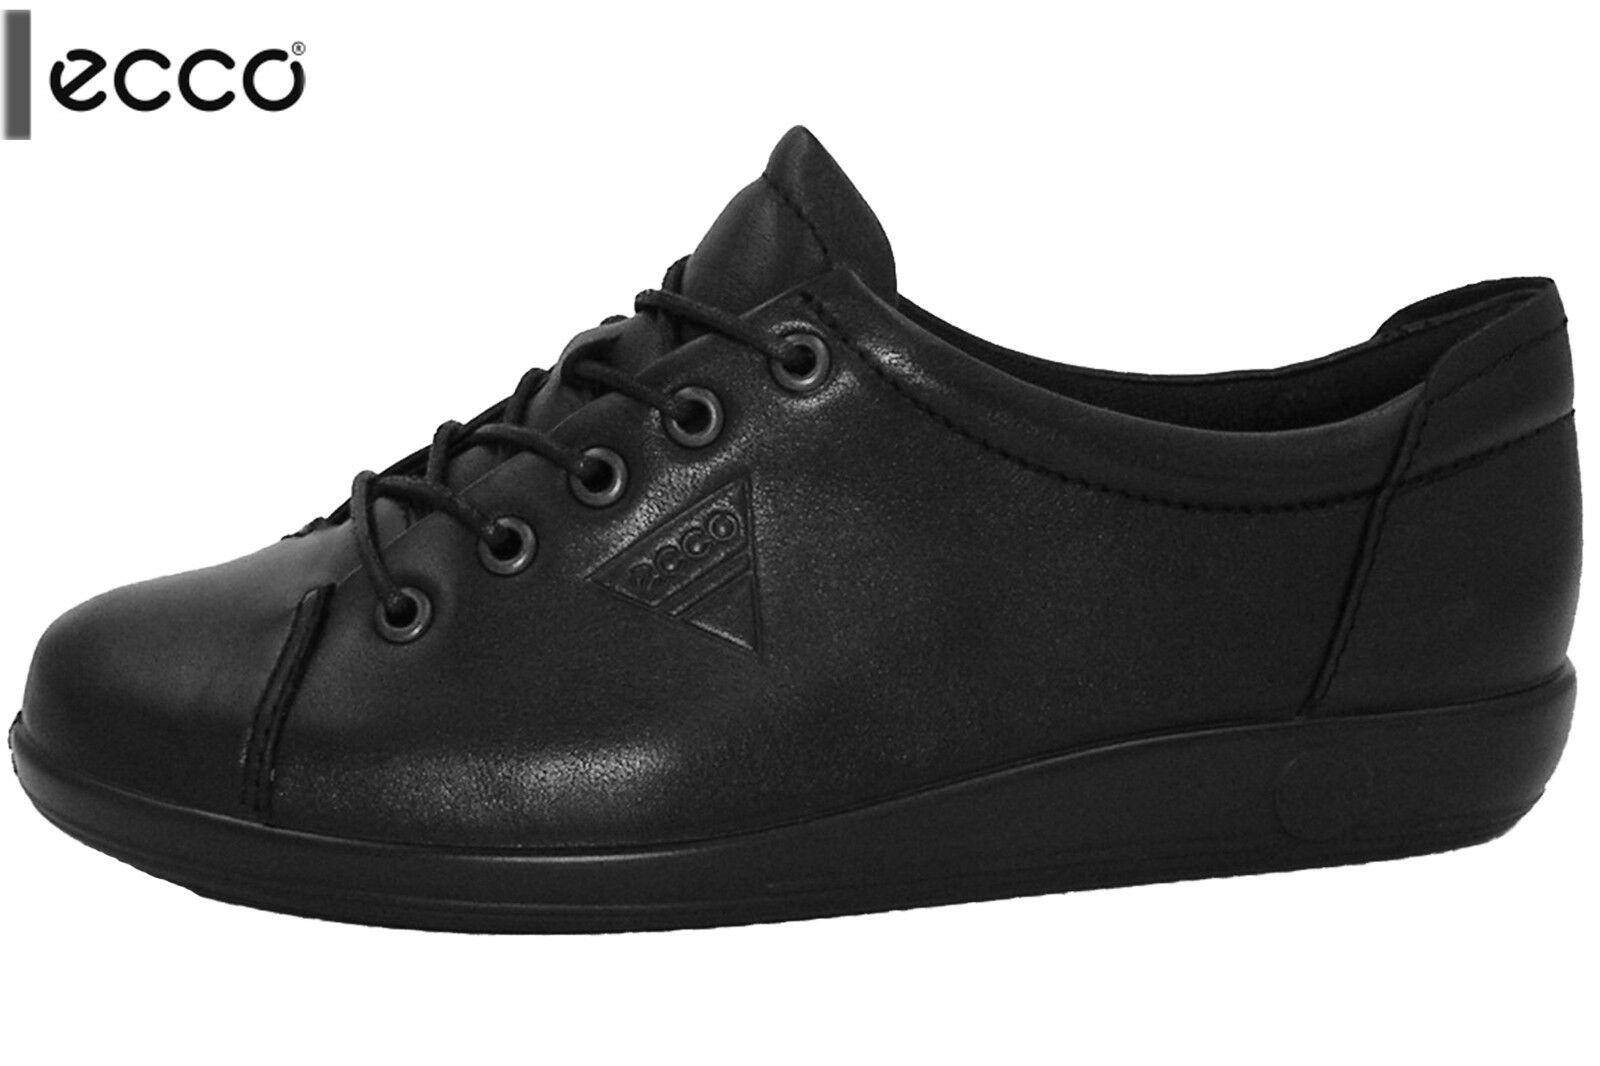 ECCO Soft 2.0 Damen Sneaker Schwarz Echt Leder Schuhe 20650356723